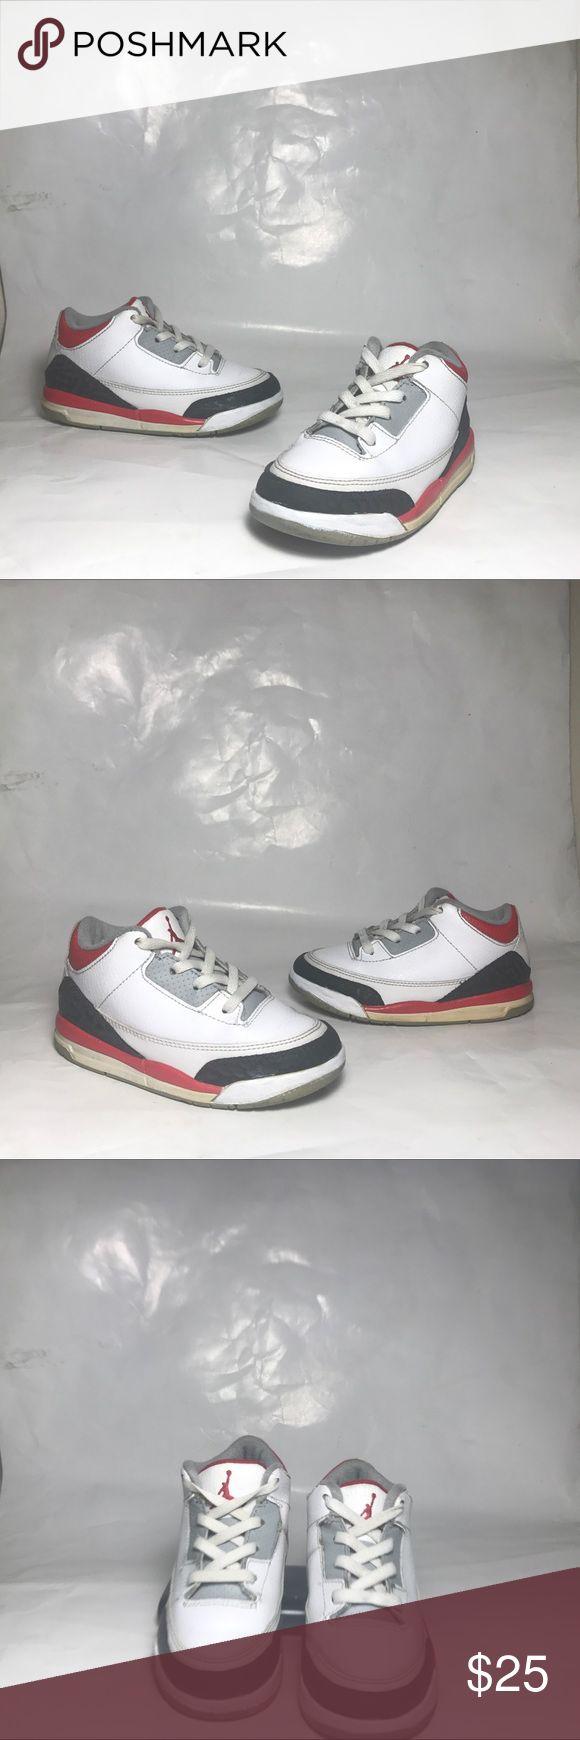 separation shoes 7f62d 611e1 Pw Human Race Nmd Tr